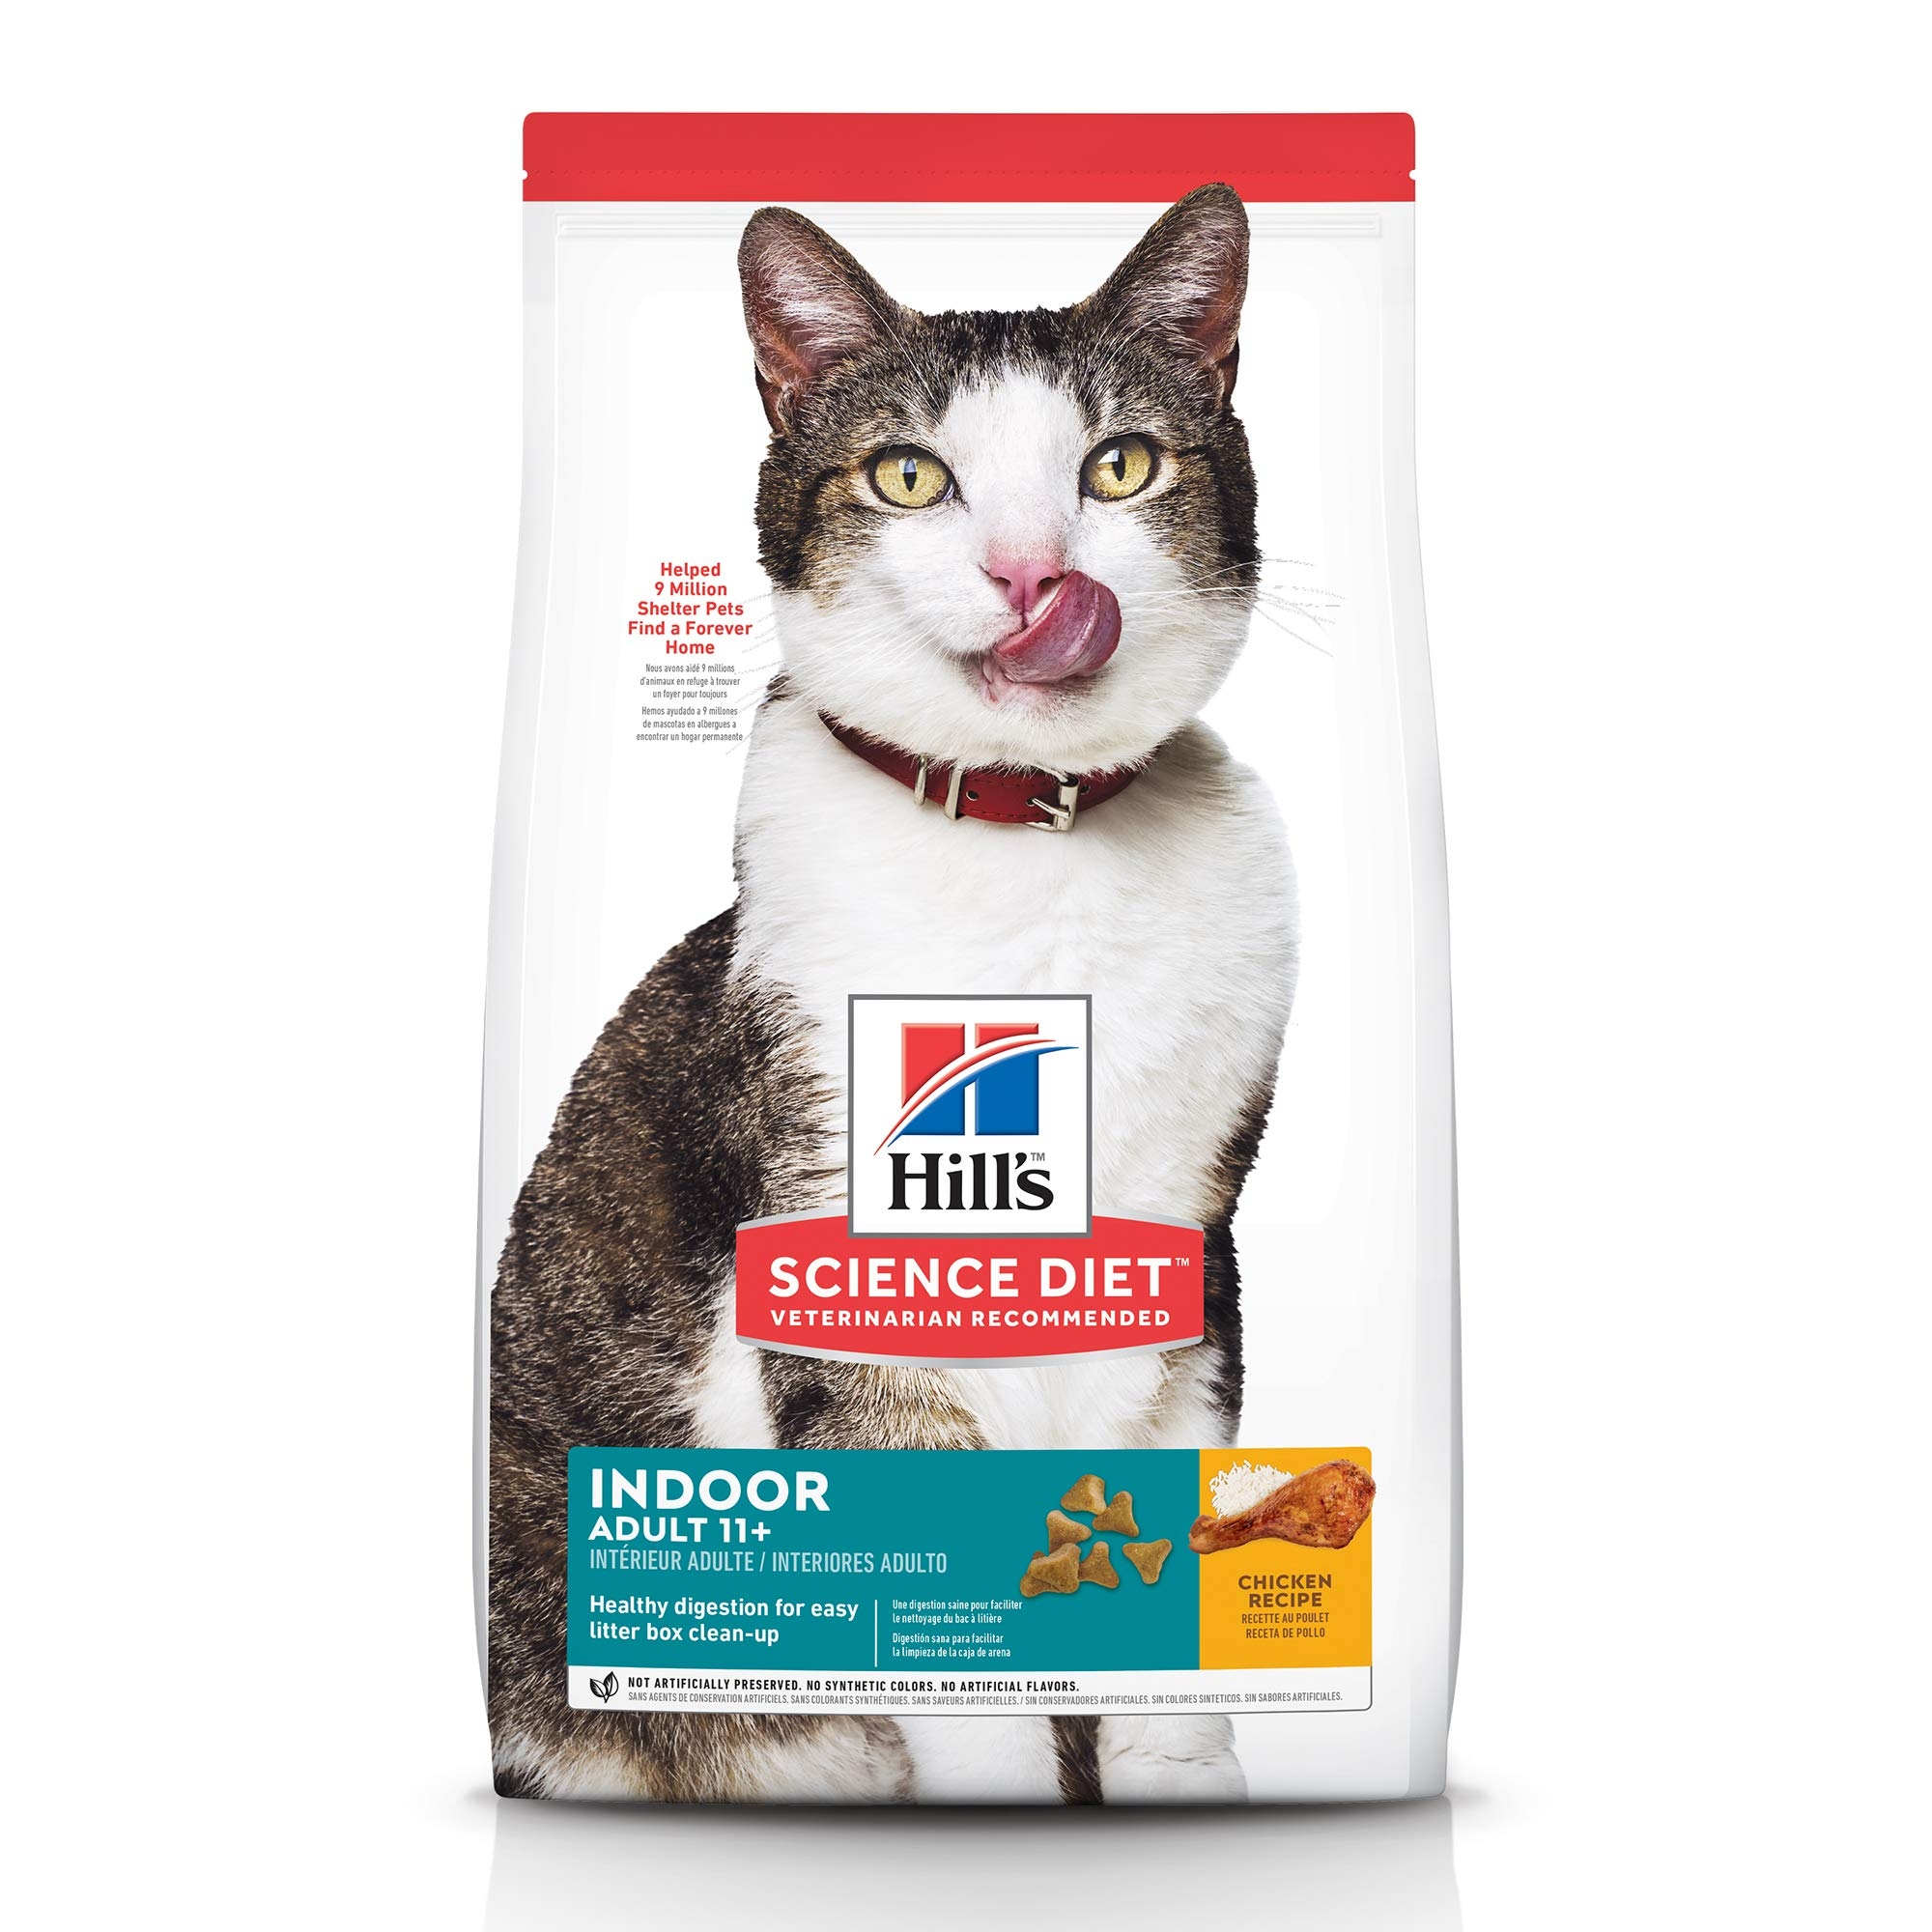 hills sc ience diet cat food